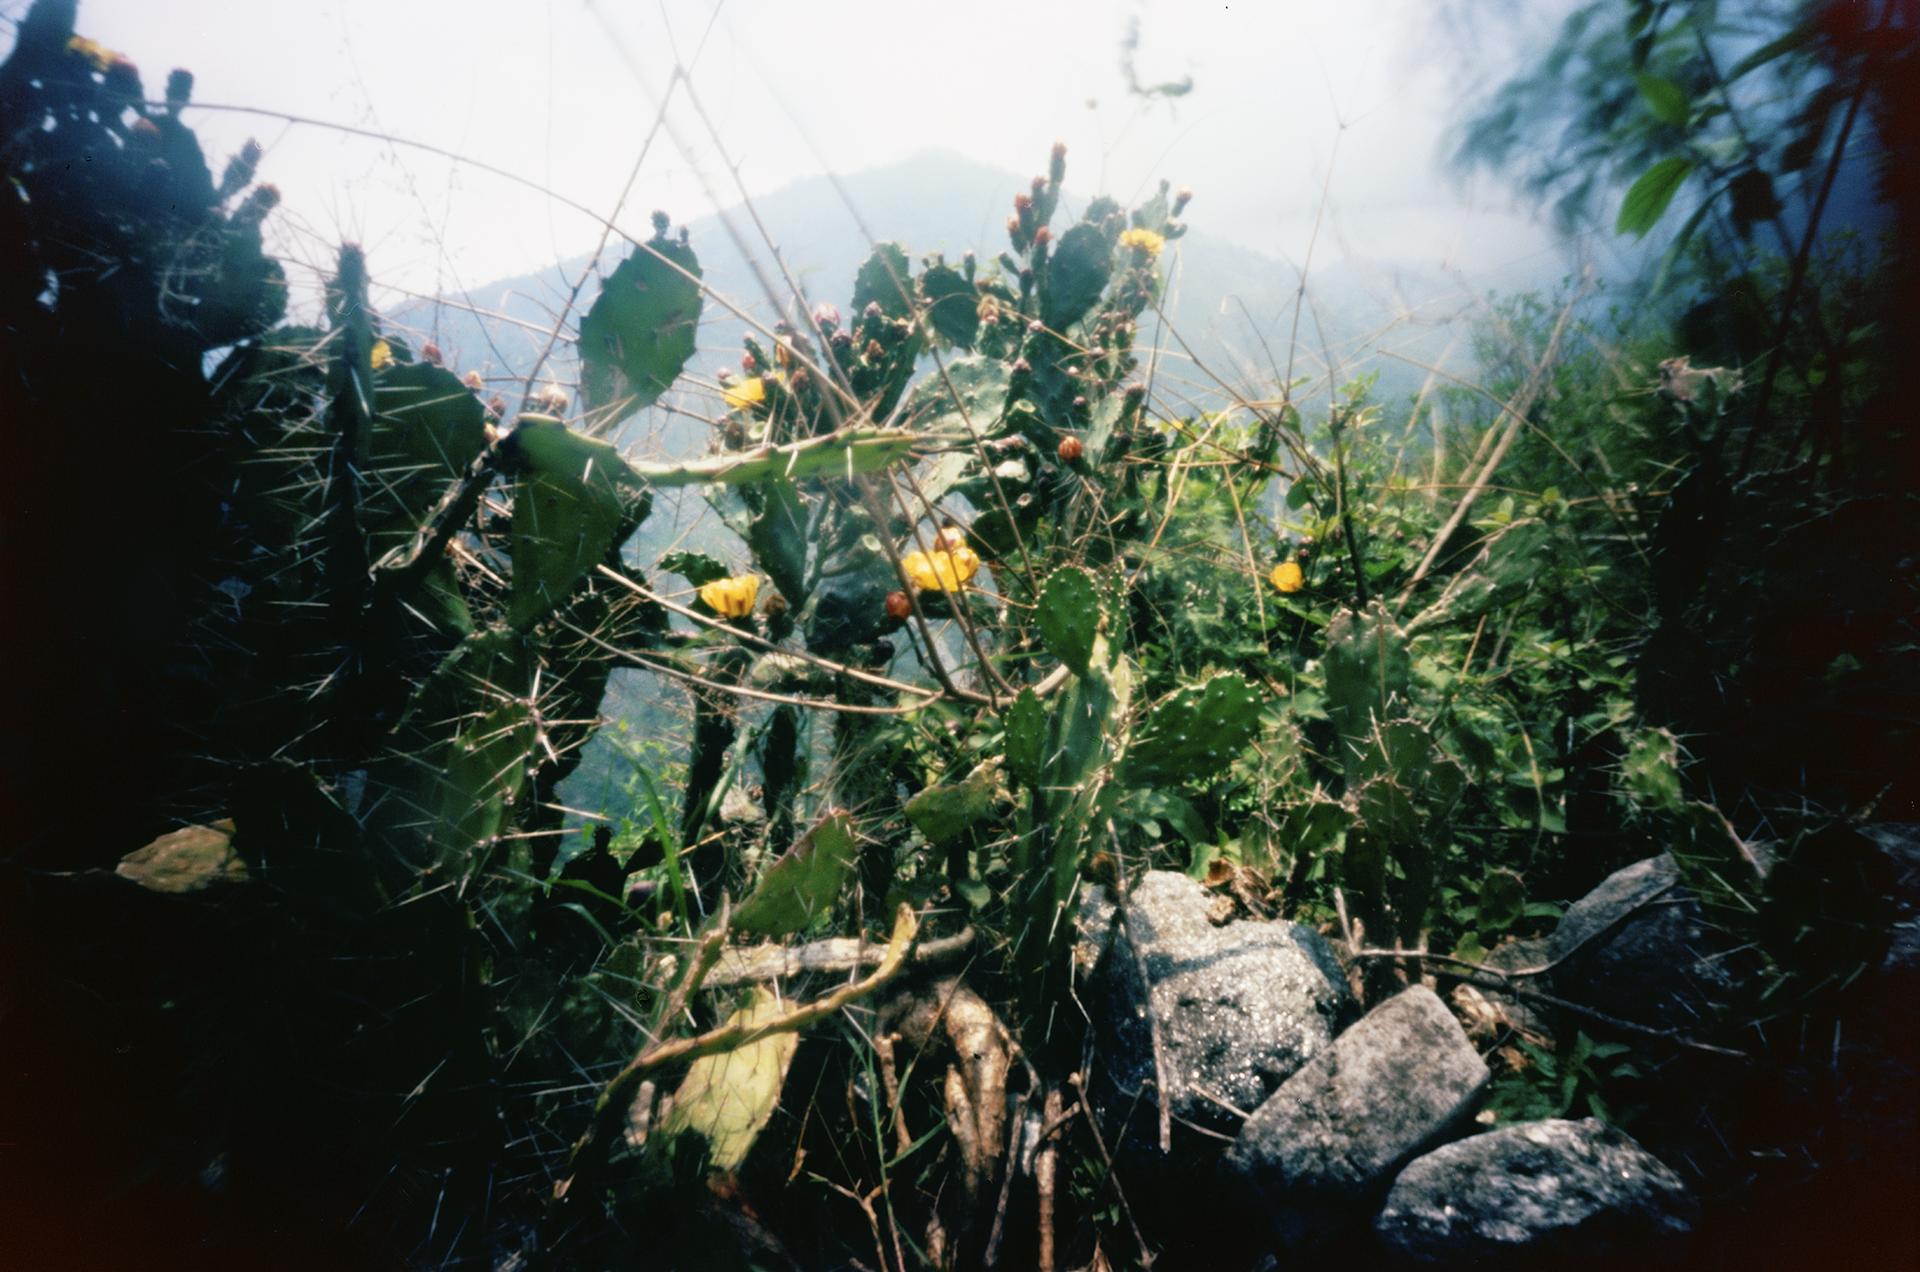 Cactus. Kalopani, Nepal, 2012